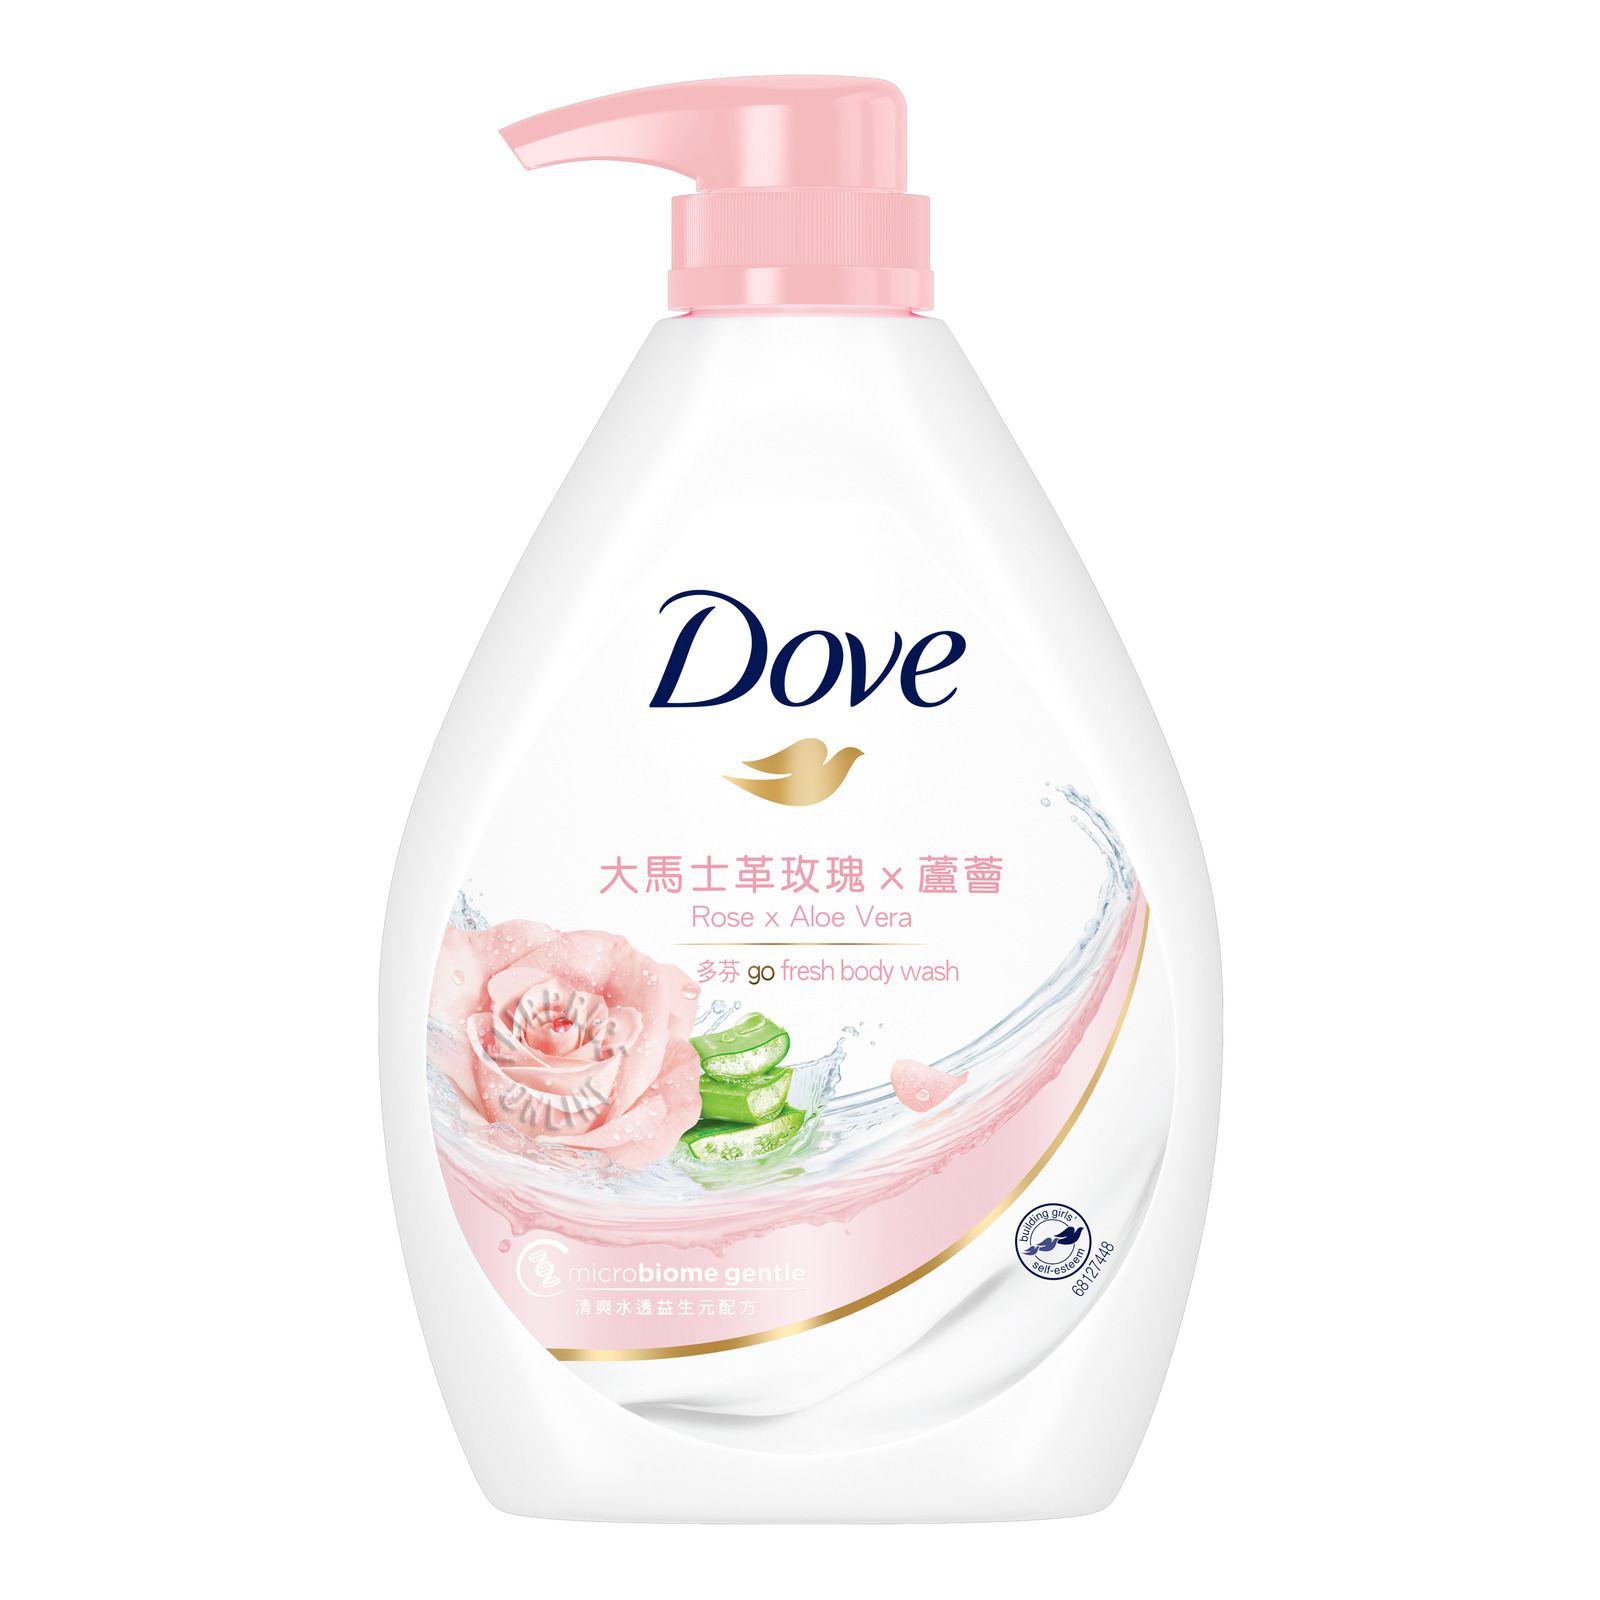 Dove Go Fresh Paraben-Free Body Wash - Rose Pomegranate